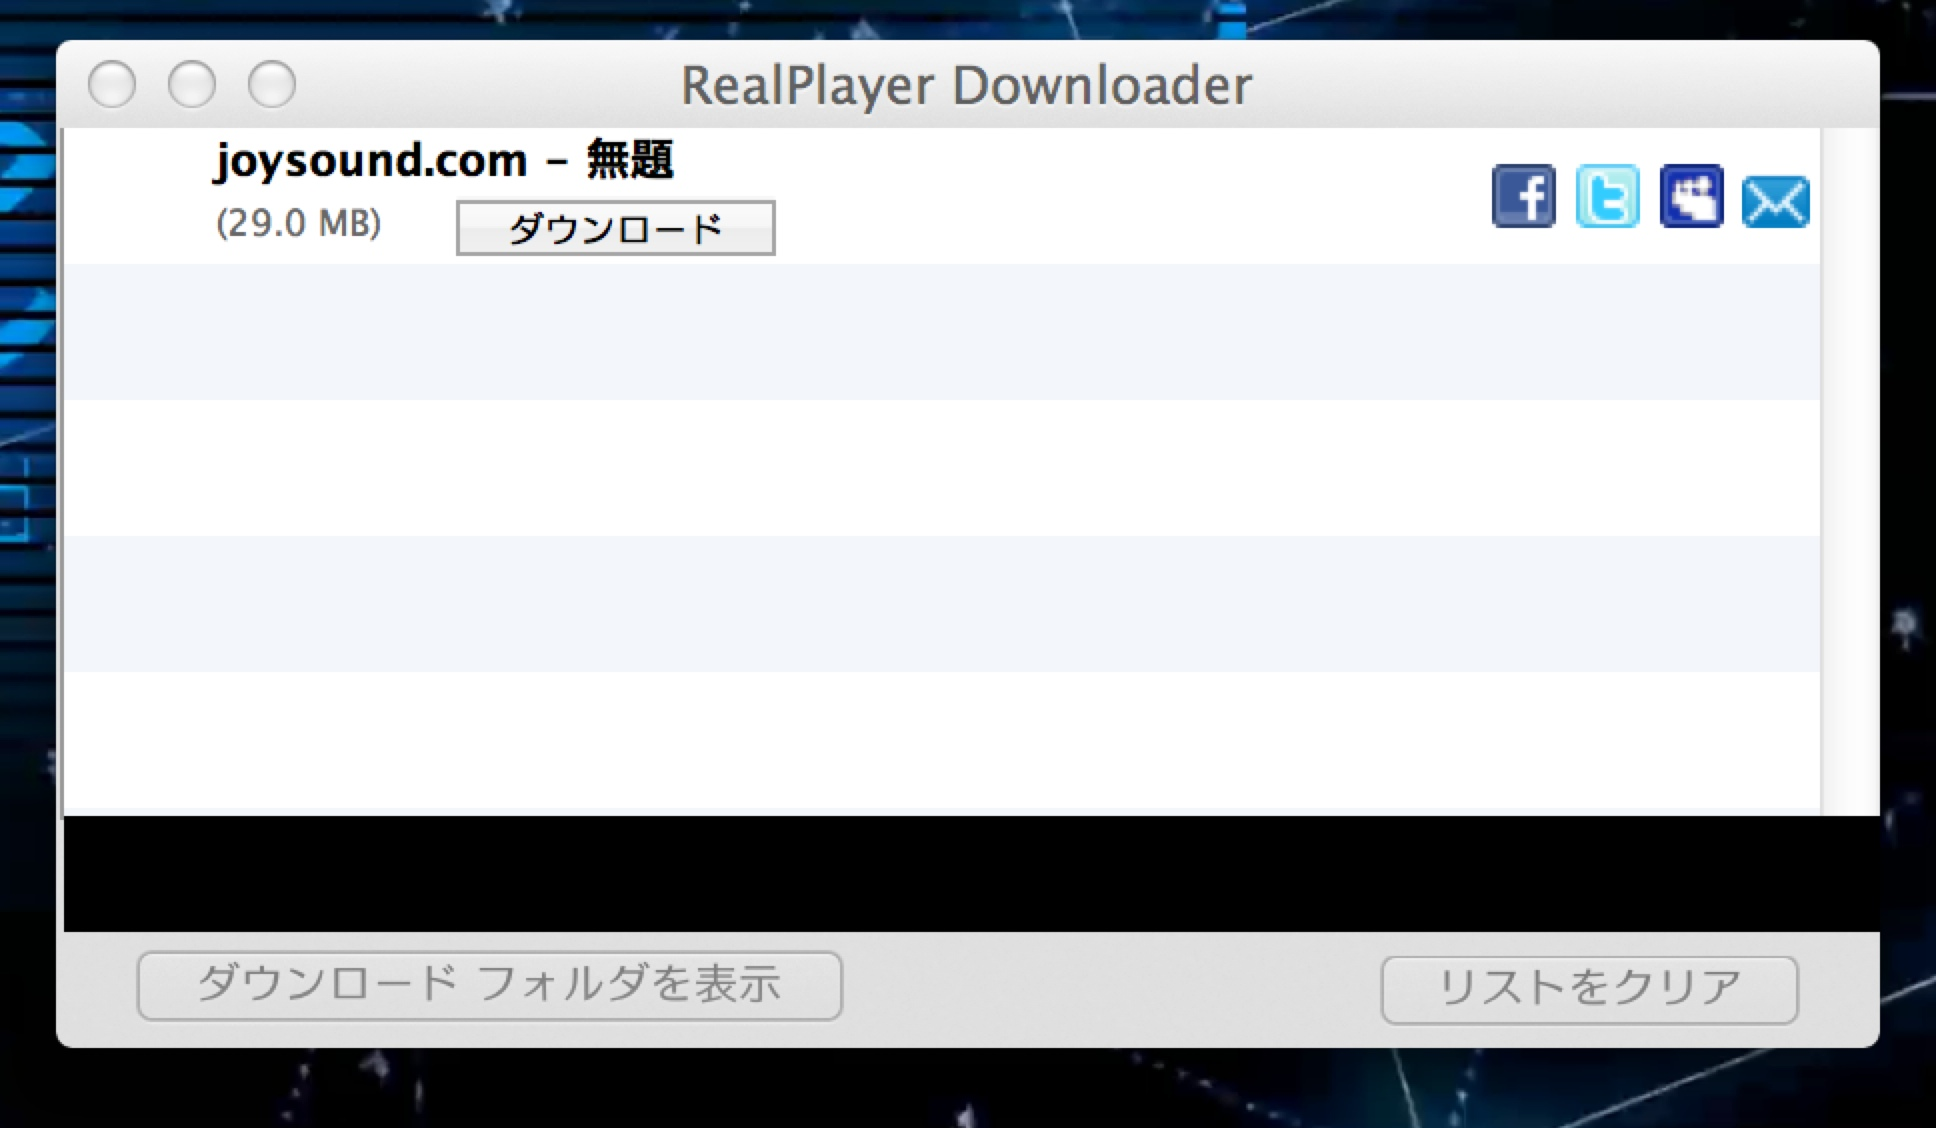 realplayerdl